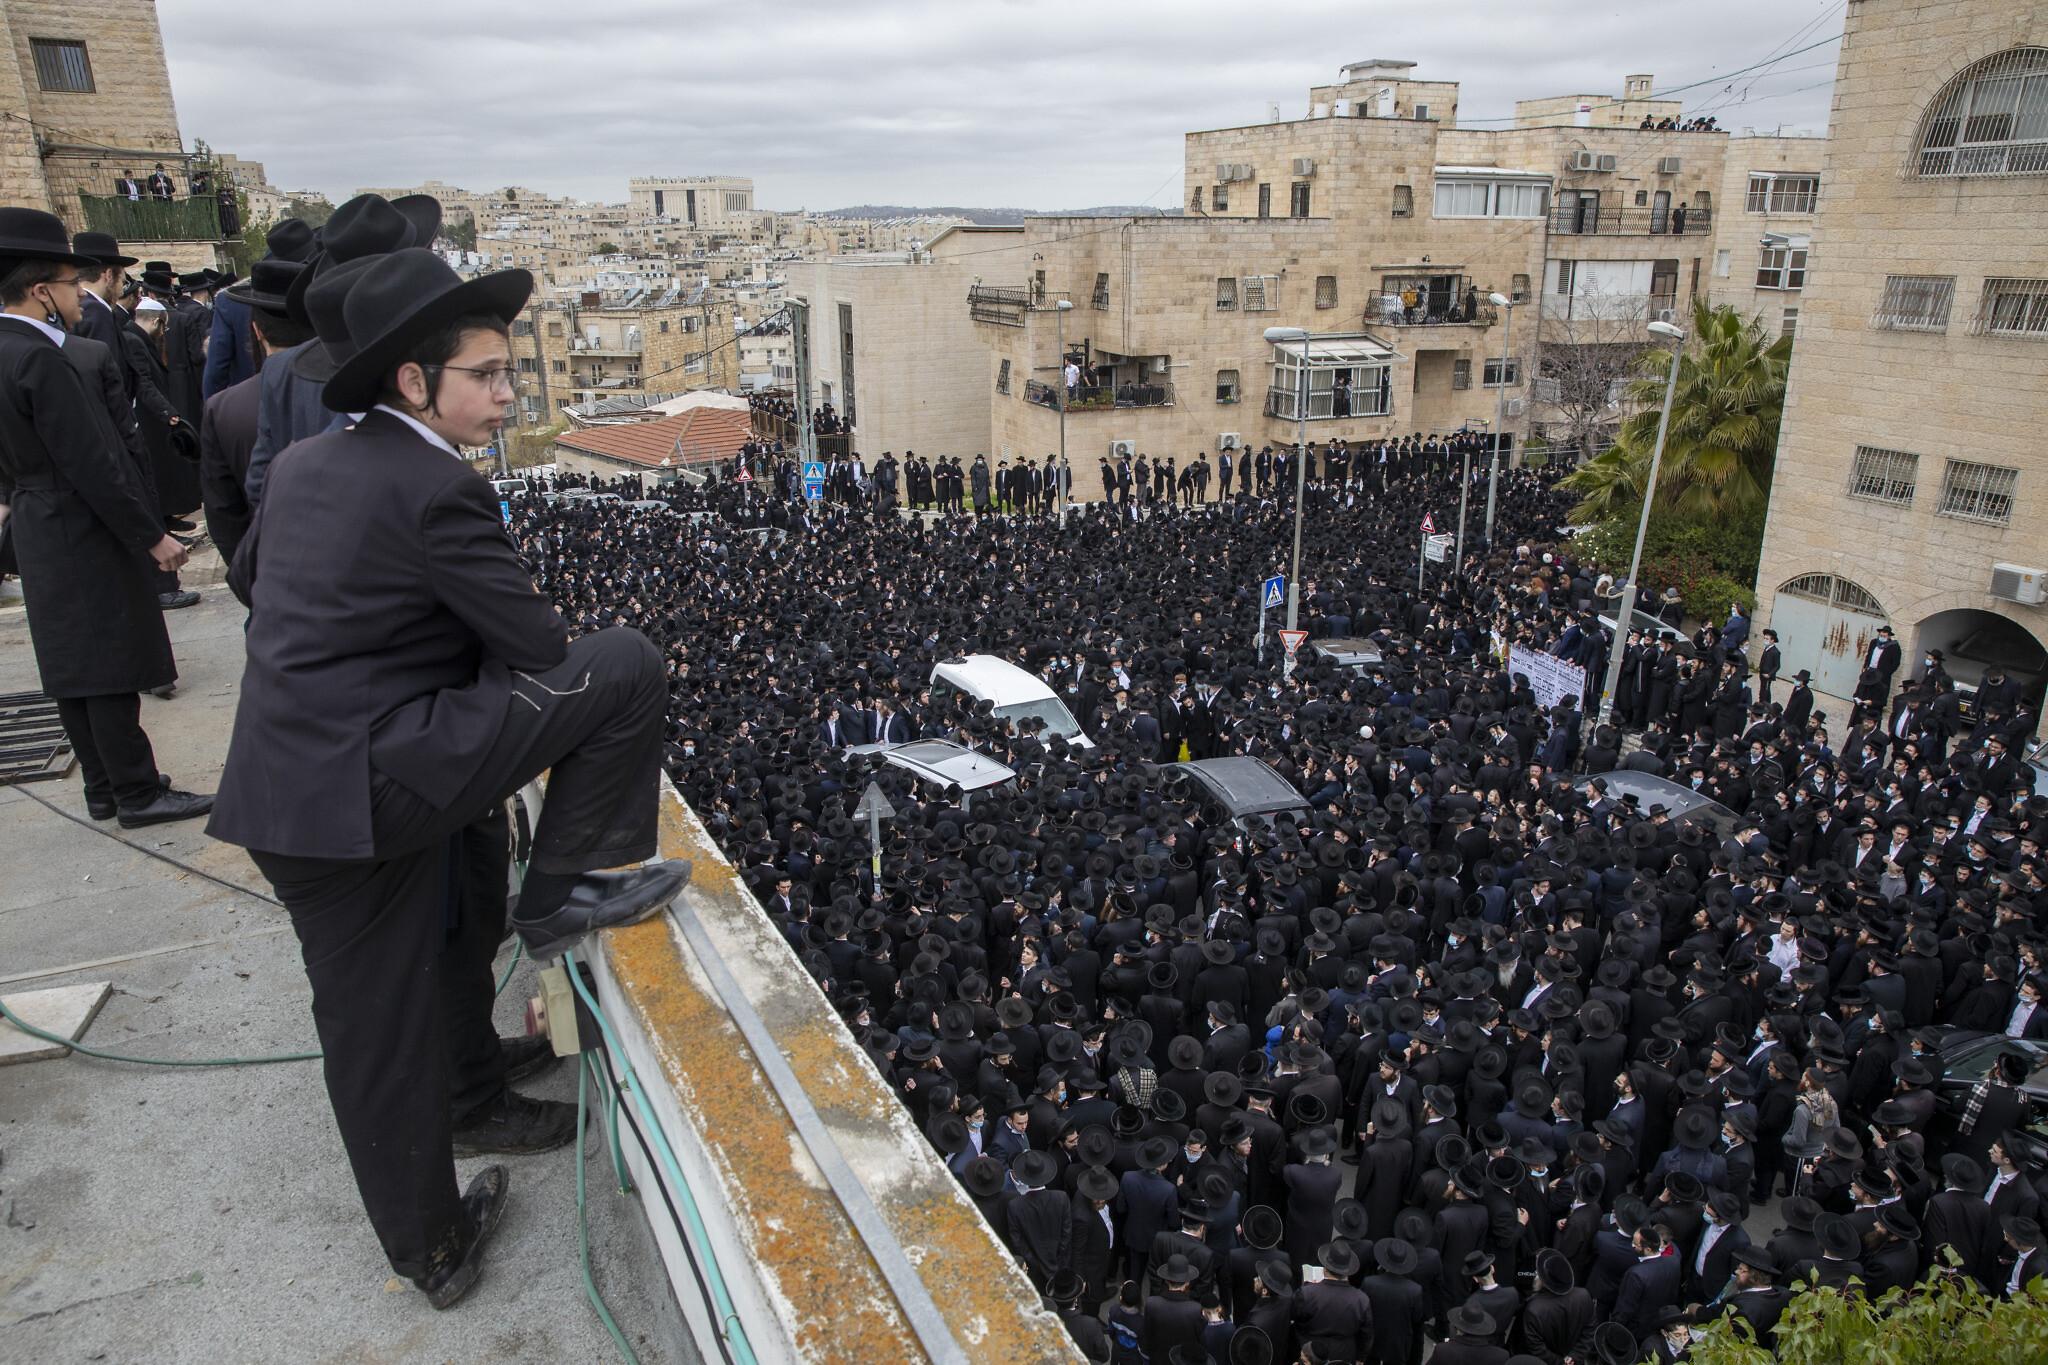 Israel extends lockdown, sees delay in COVID-19 turnaround